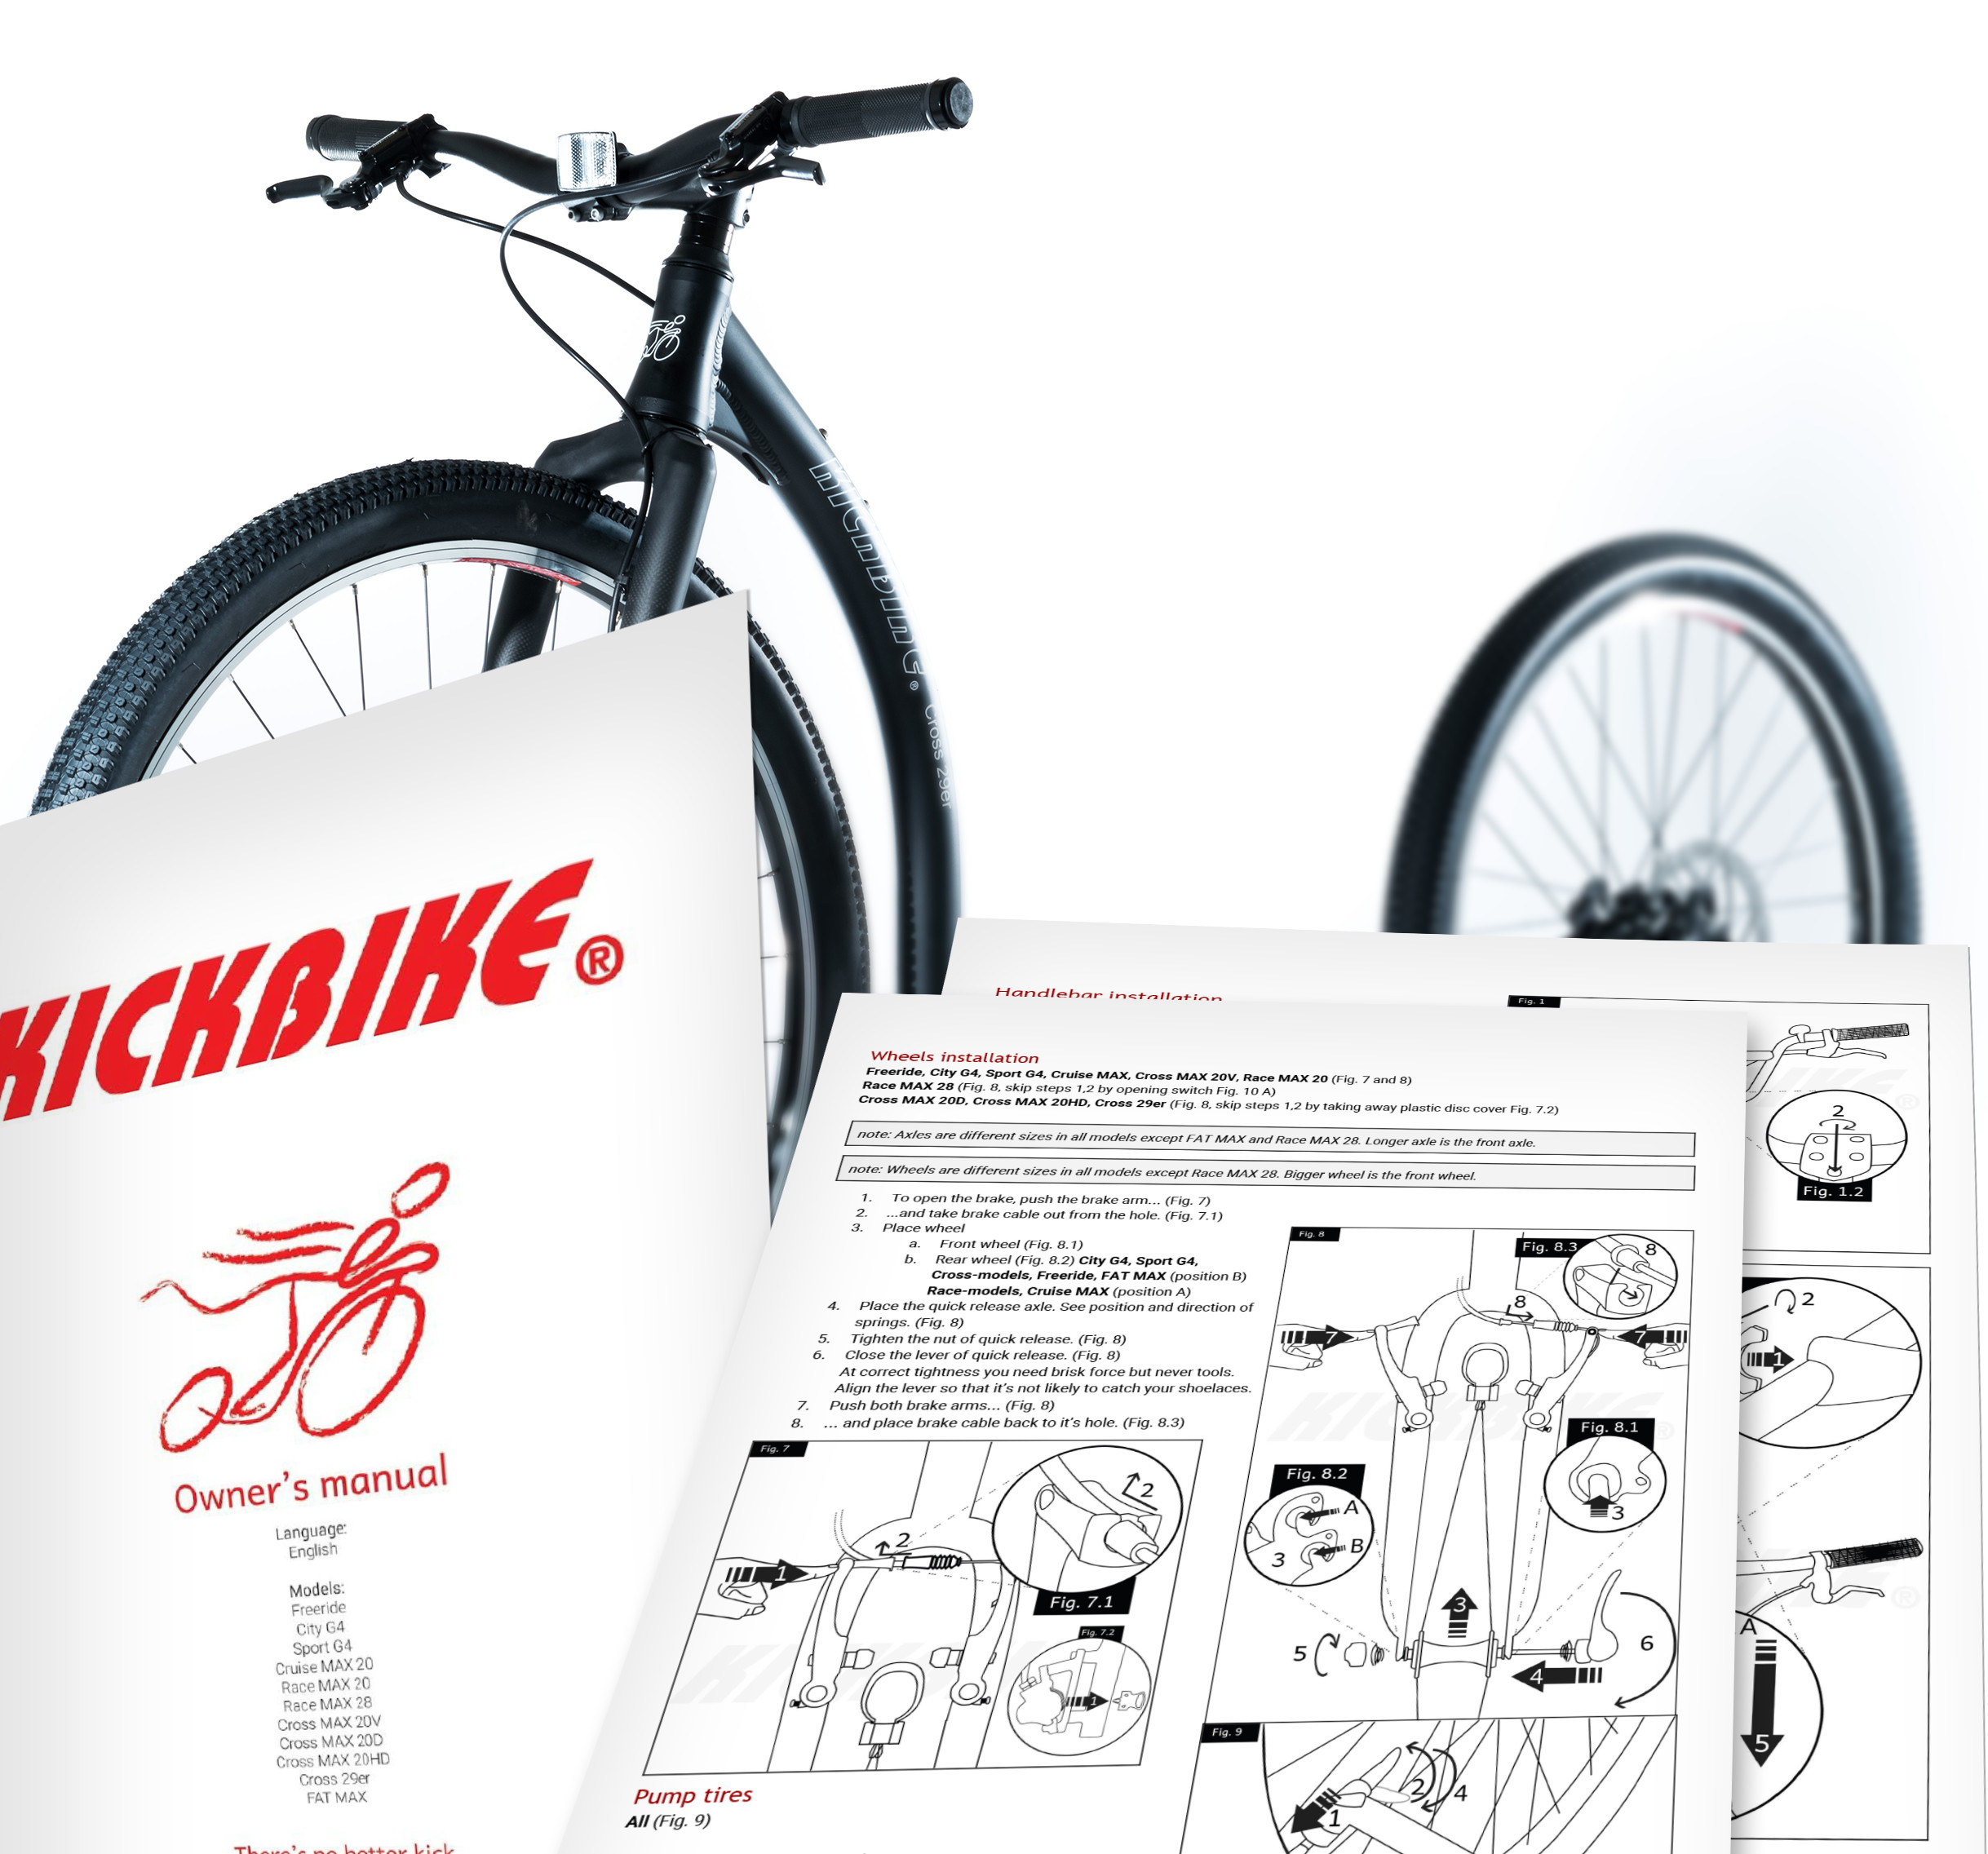 kickbike worldwide owner s manuals info downloads rh kickbike com the complete bike owner's manual exercise bike owner's manuals